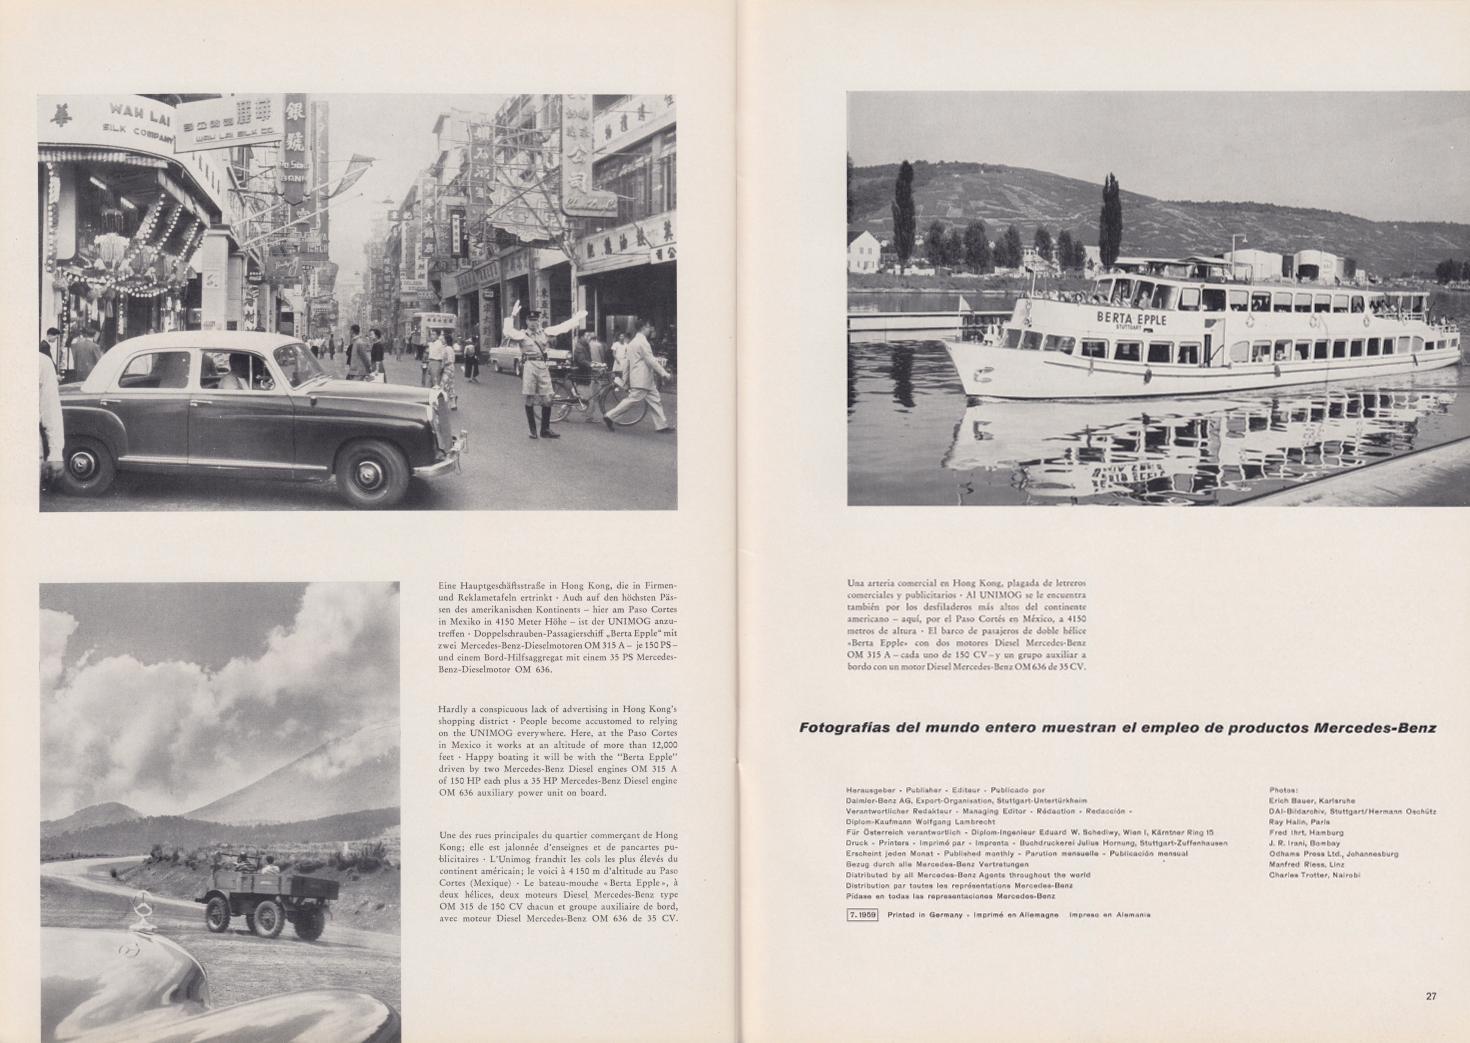 (REVISTA): Periódico In aller welt n.º 33 - Mercedes-Benz no mundo - 1959 - multilingue 014